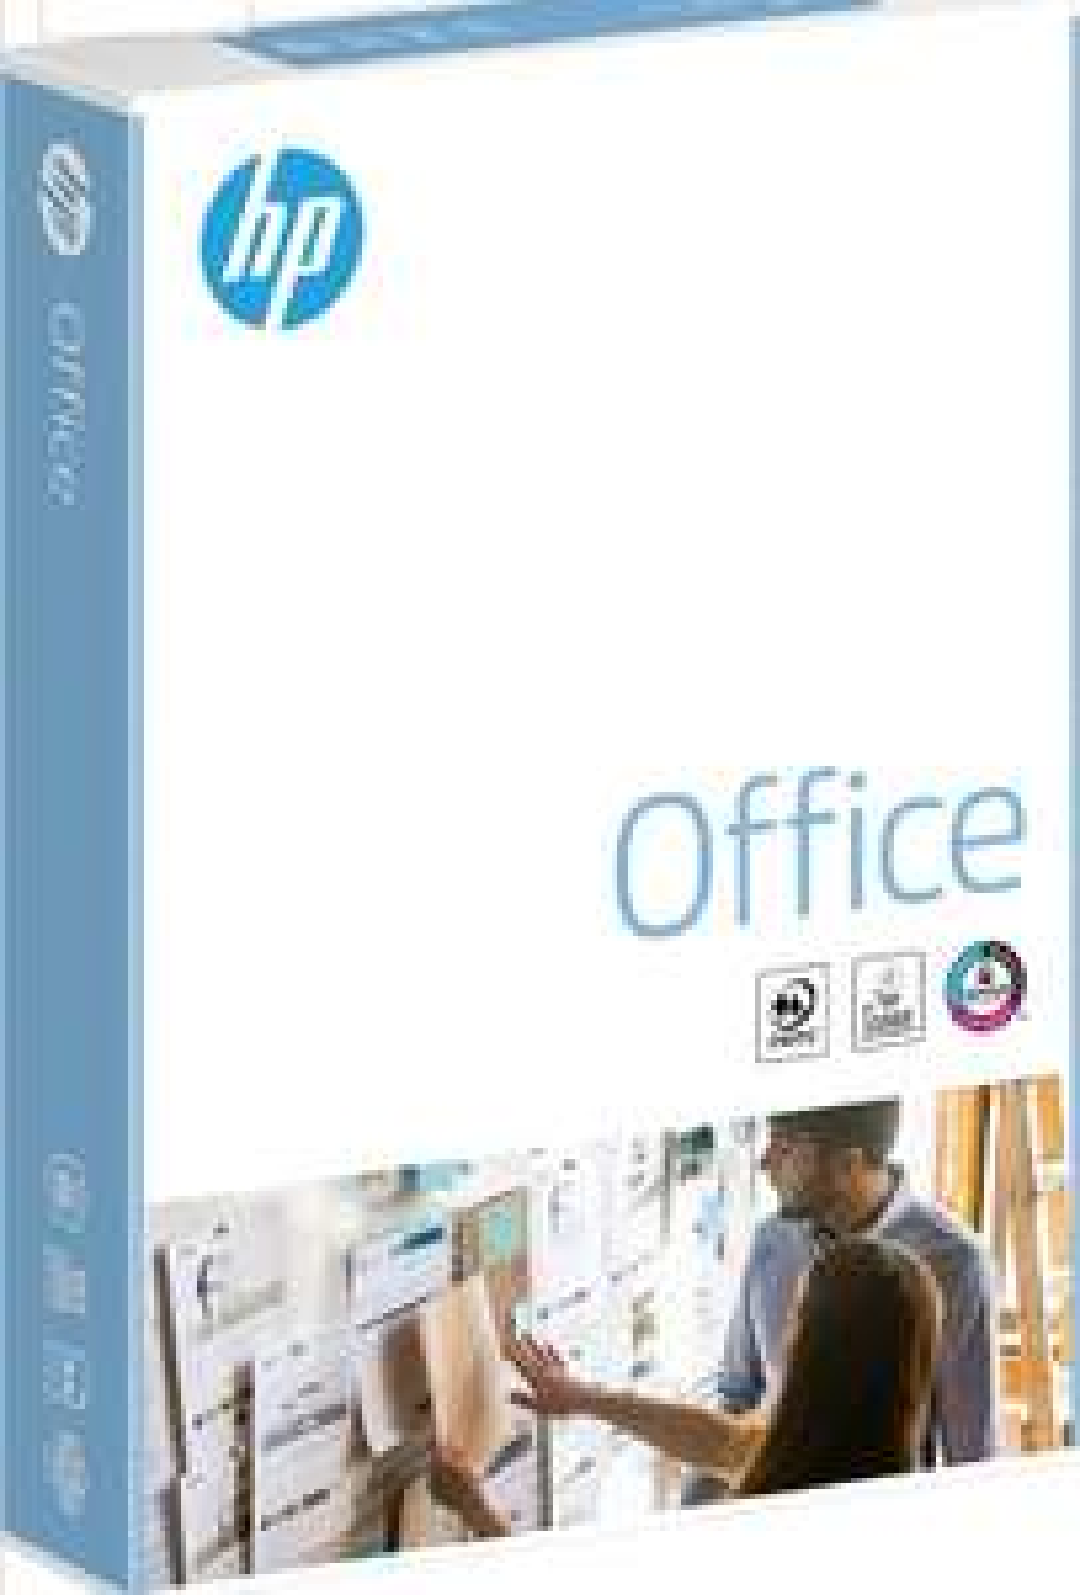 HP Office A4 210 x 297mm 80gsm 500 sheets/Single Ream - £3.47(Prime) / £7.96 (Non Prime) @ Amazon